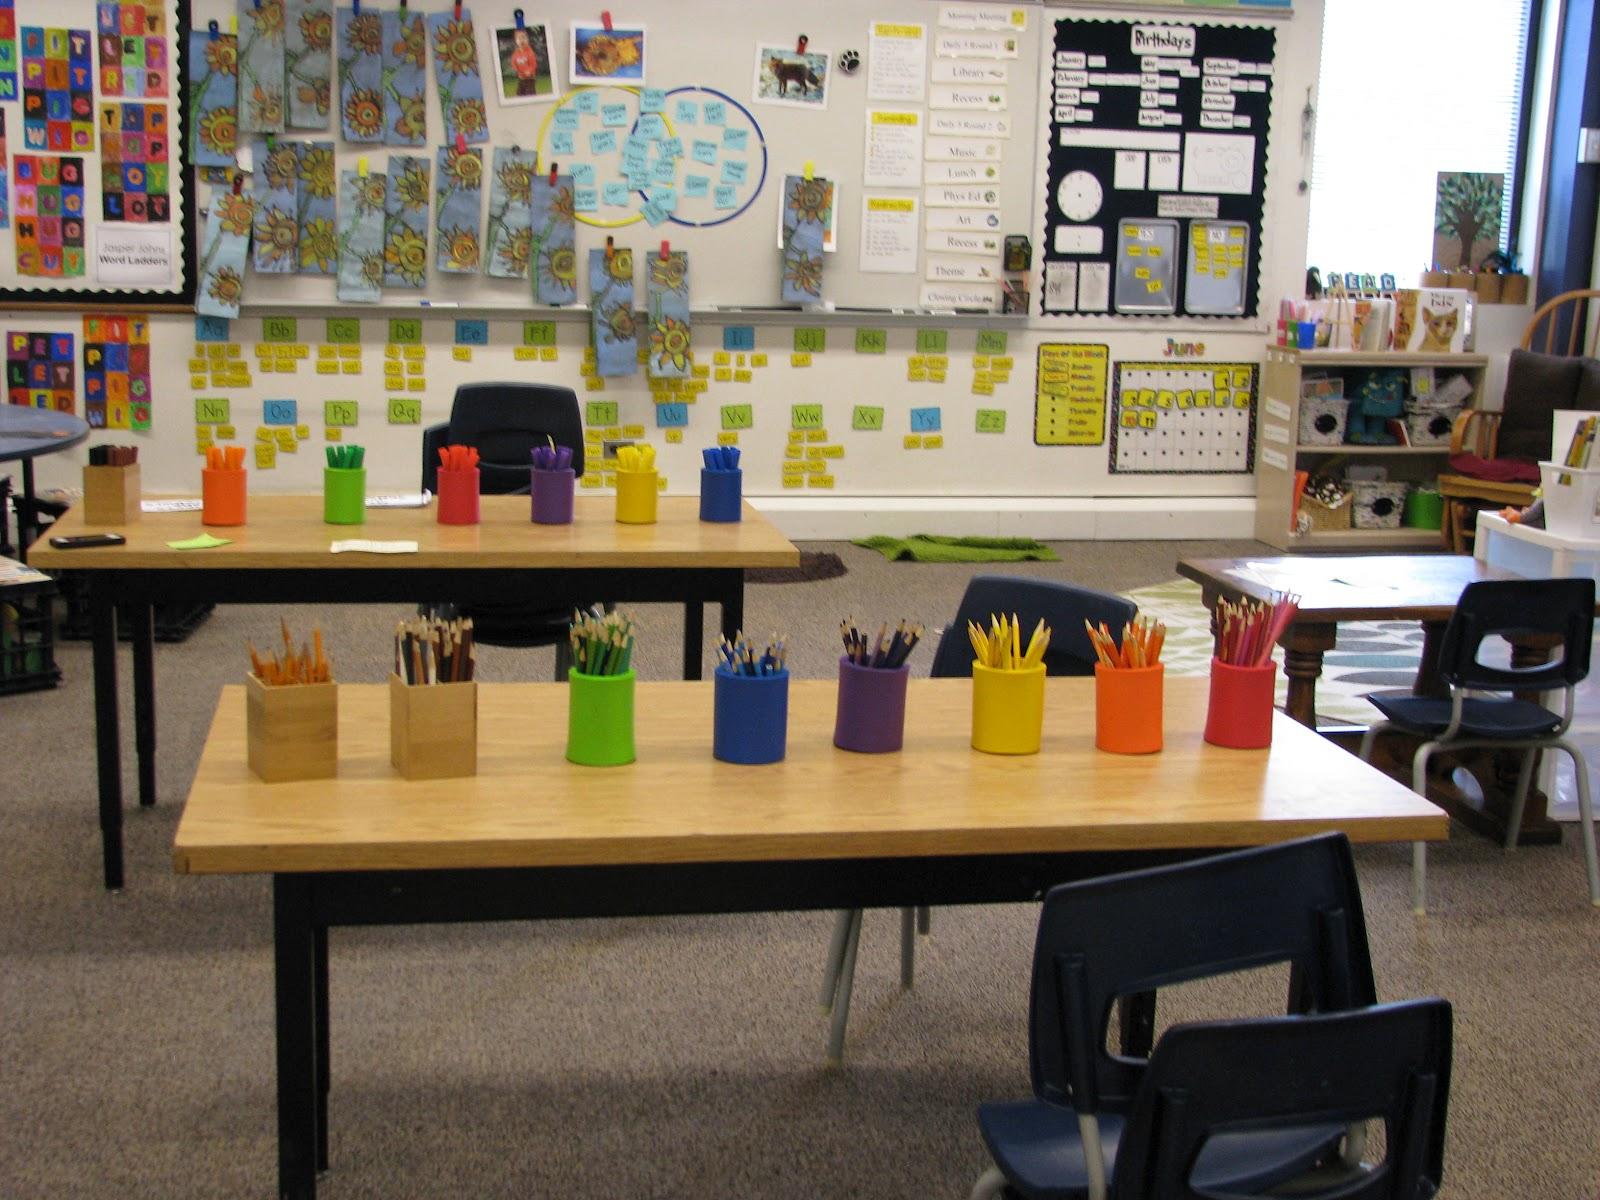 Ideas In Classroom ~ The reading corner my classroom